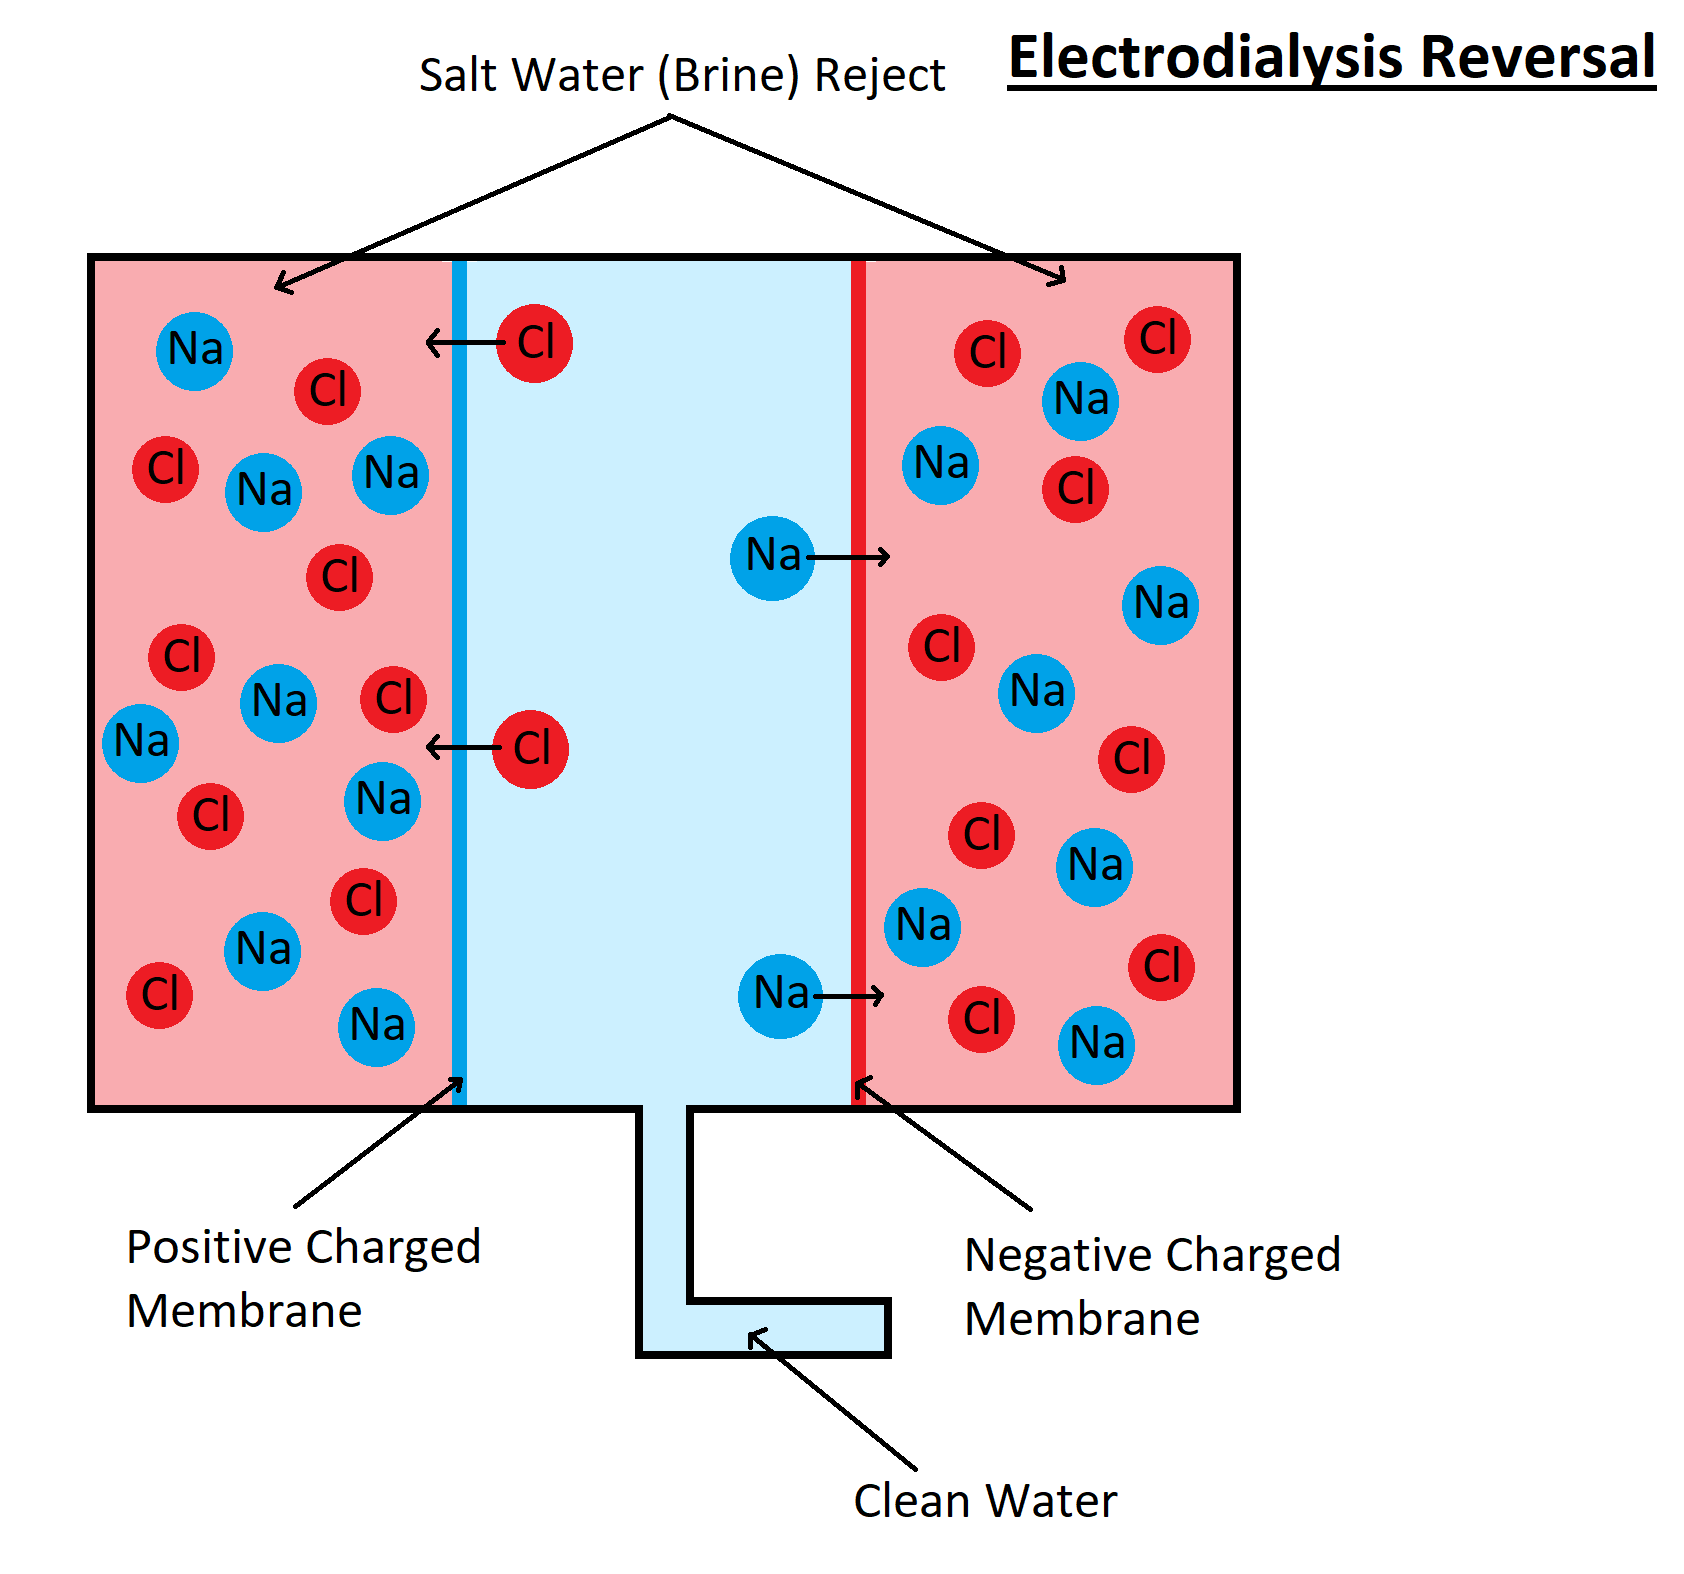 Electrodialysis Reversal